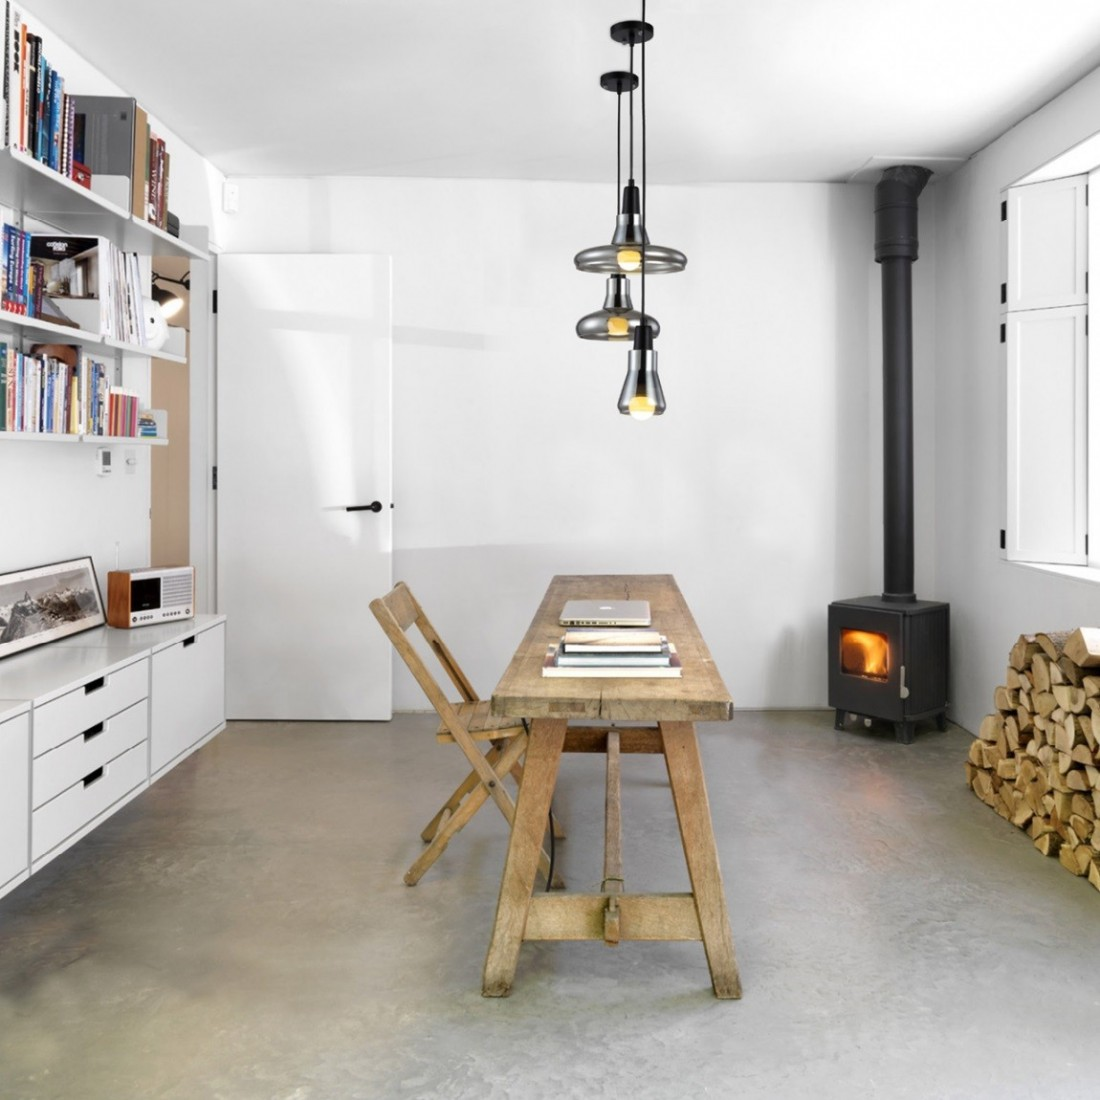 L mparas para dormitorio de ni o de madera hechas a mano - Lamparas techo ninos ...